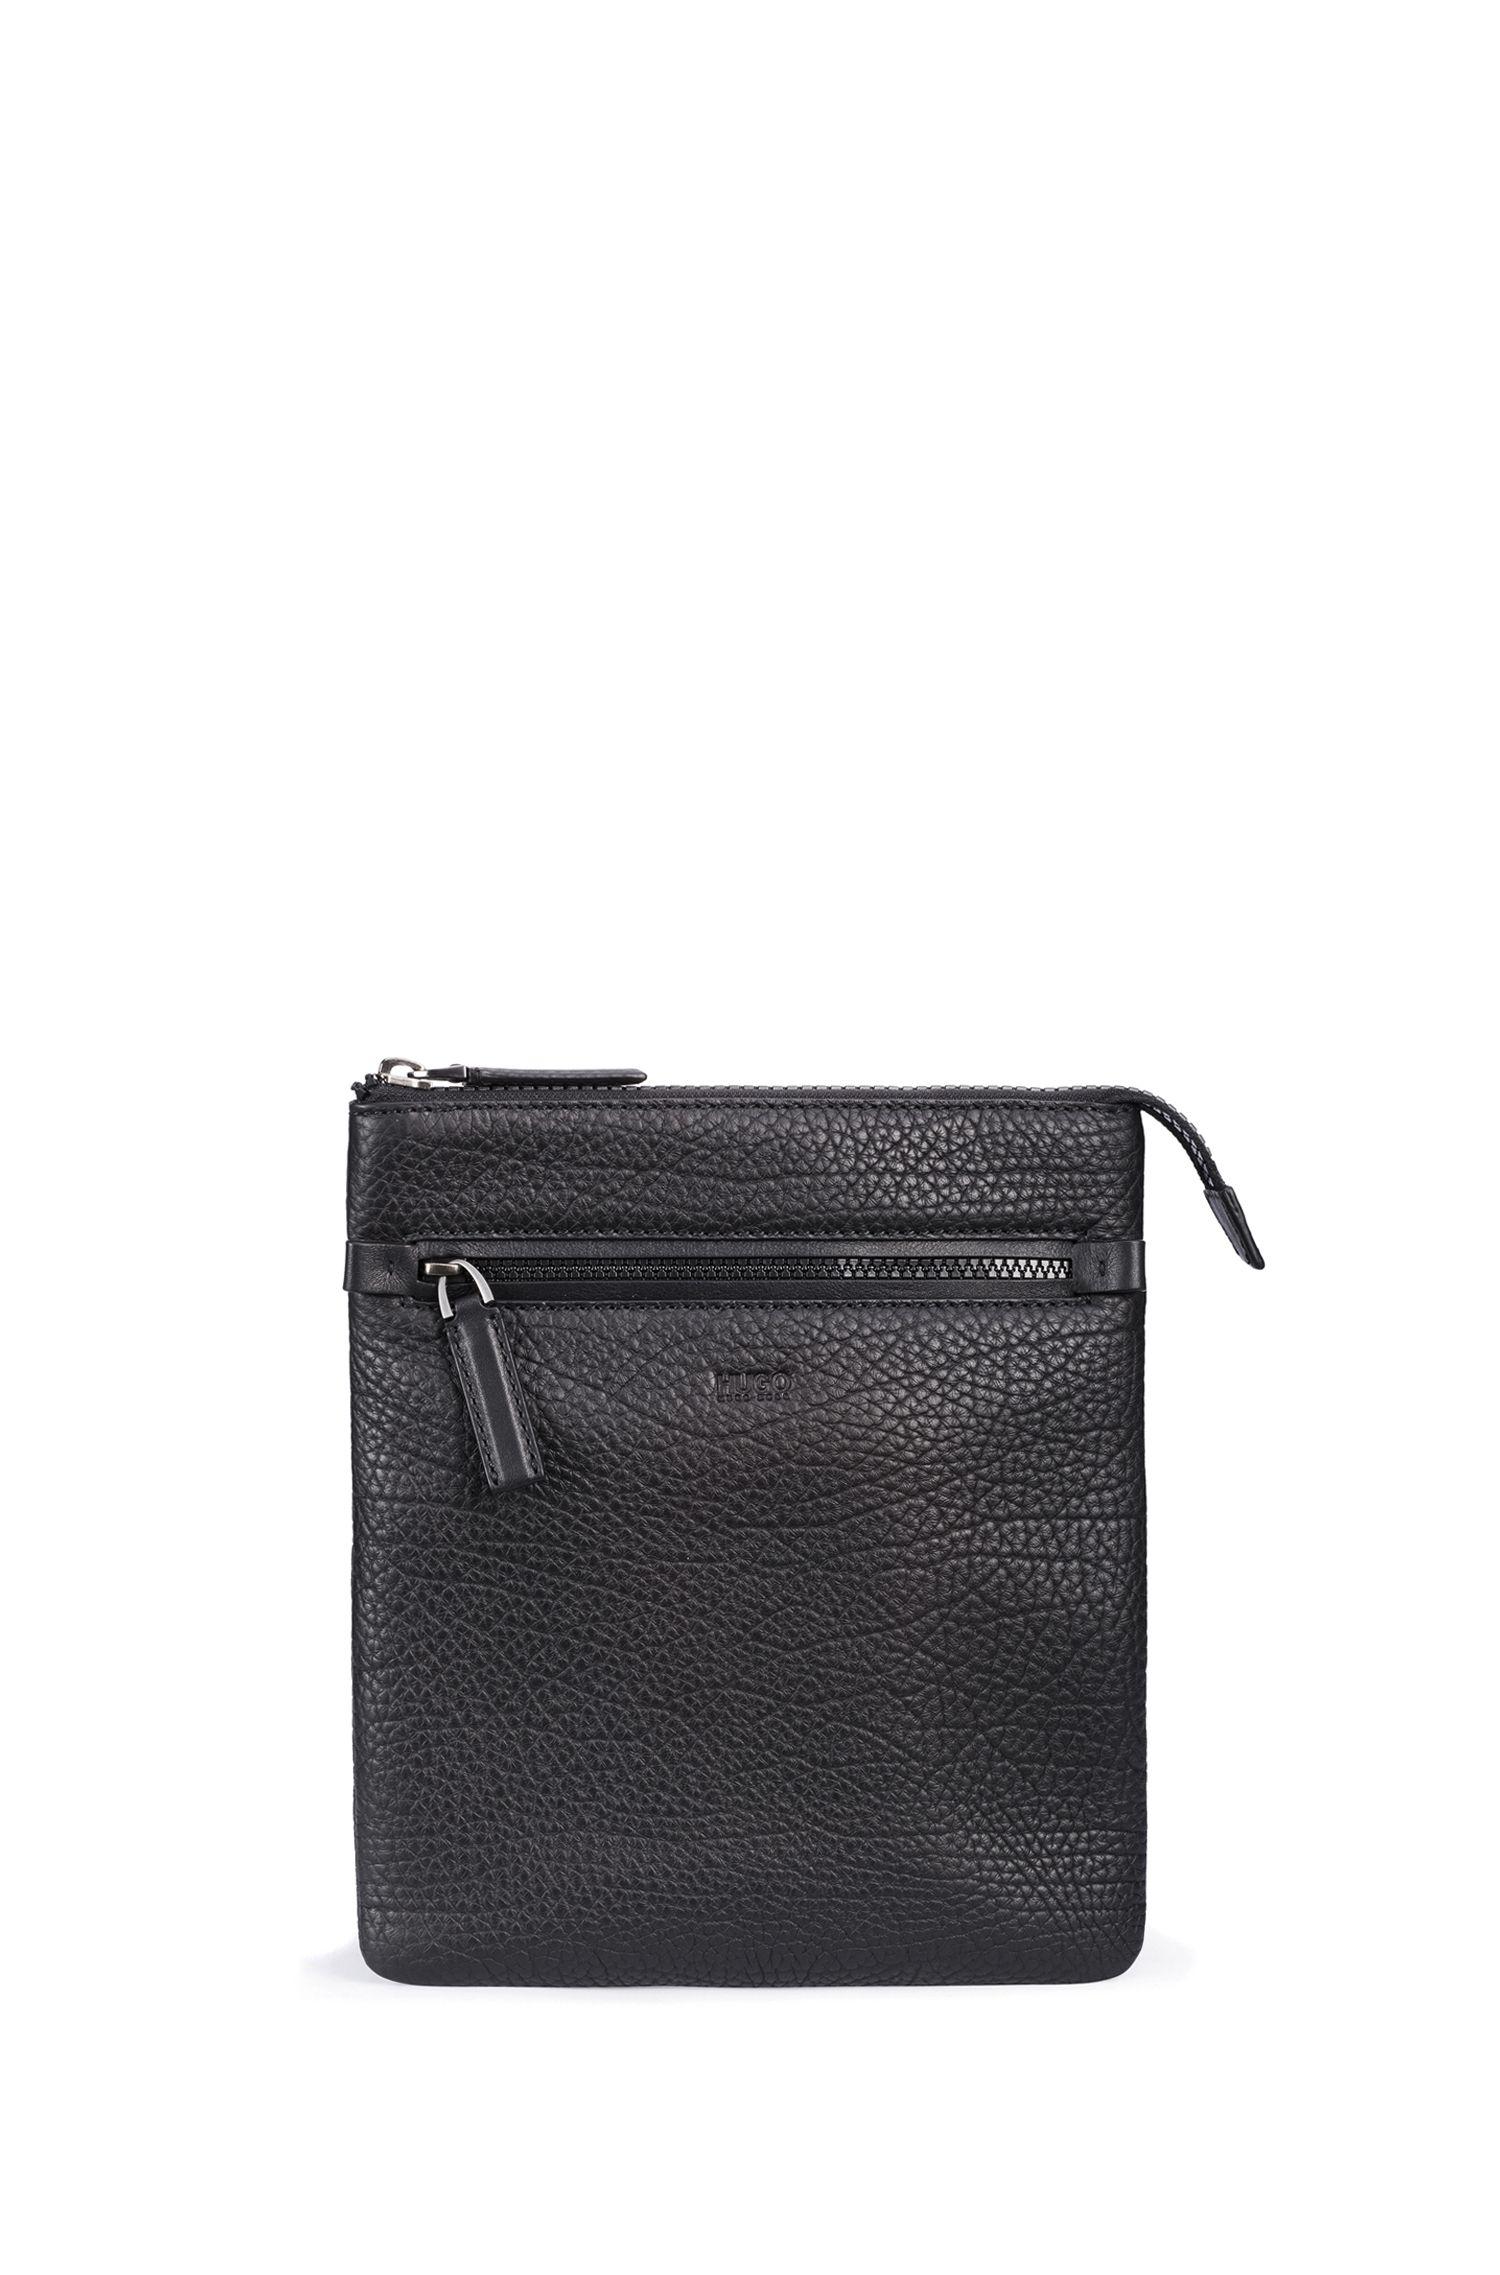 Leather Crossbody Bag | Victorian S Zip Env